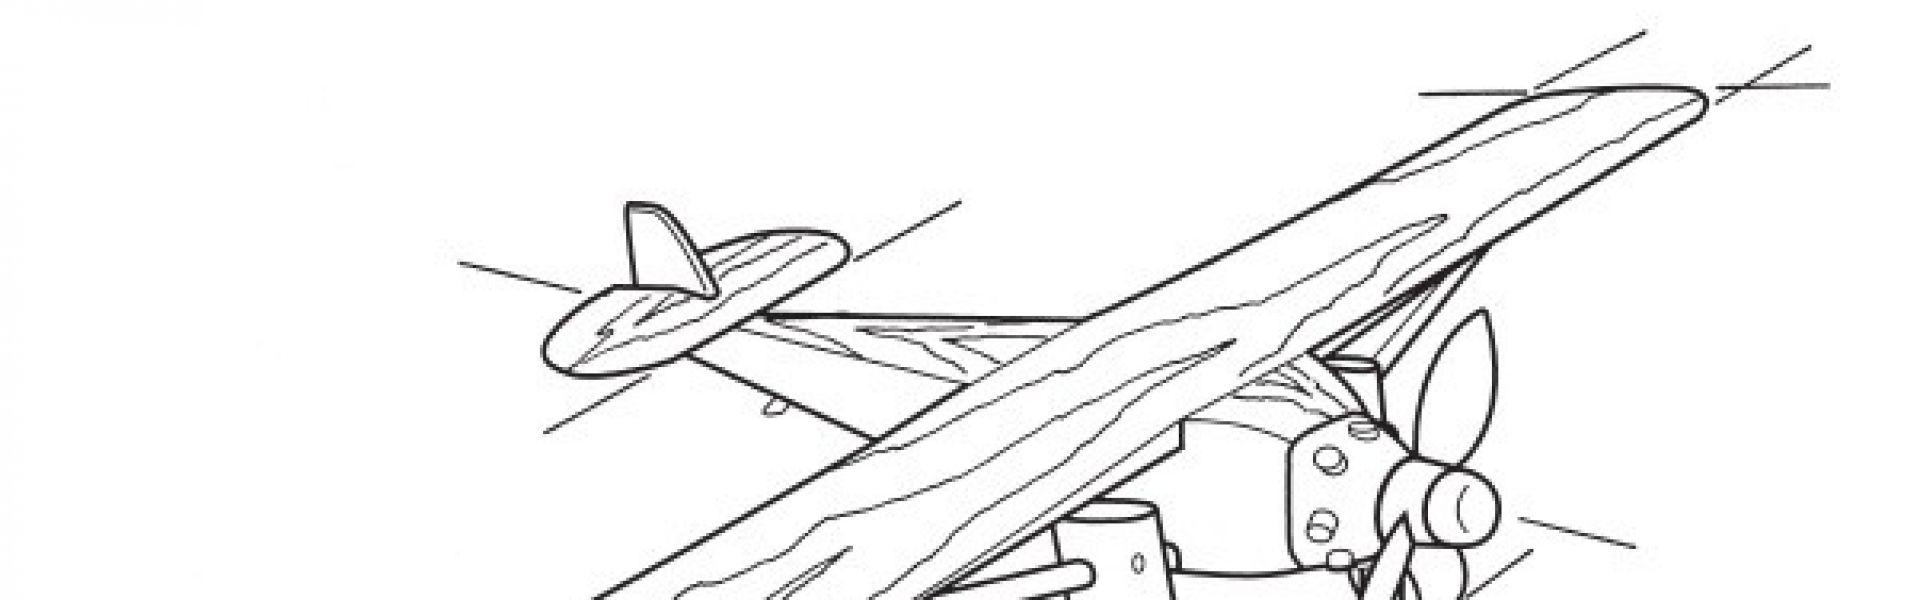 Clasimex.com Vintage Model Airplane - Modelo de Aeroplano Retro Wood Topics